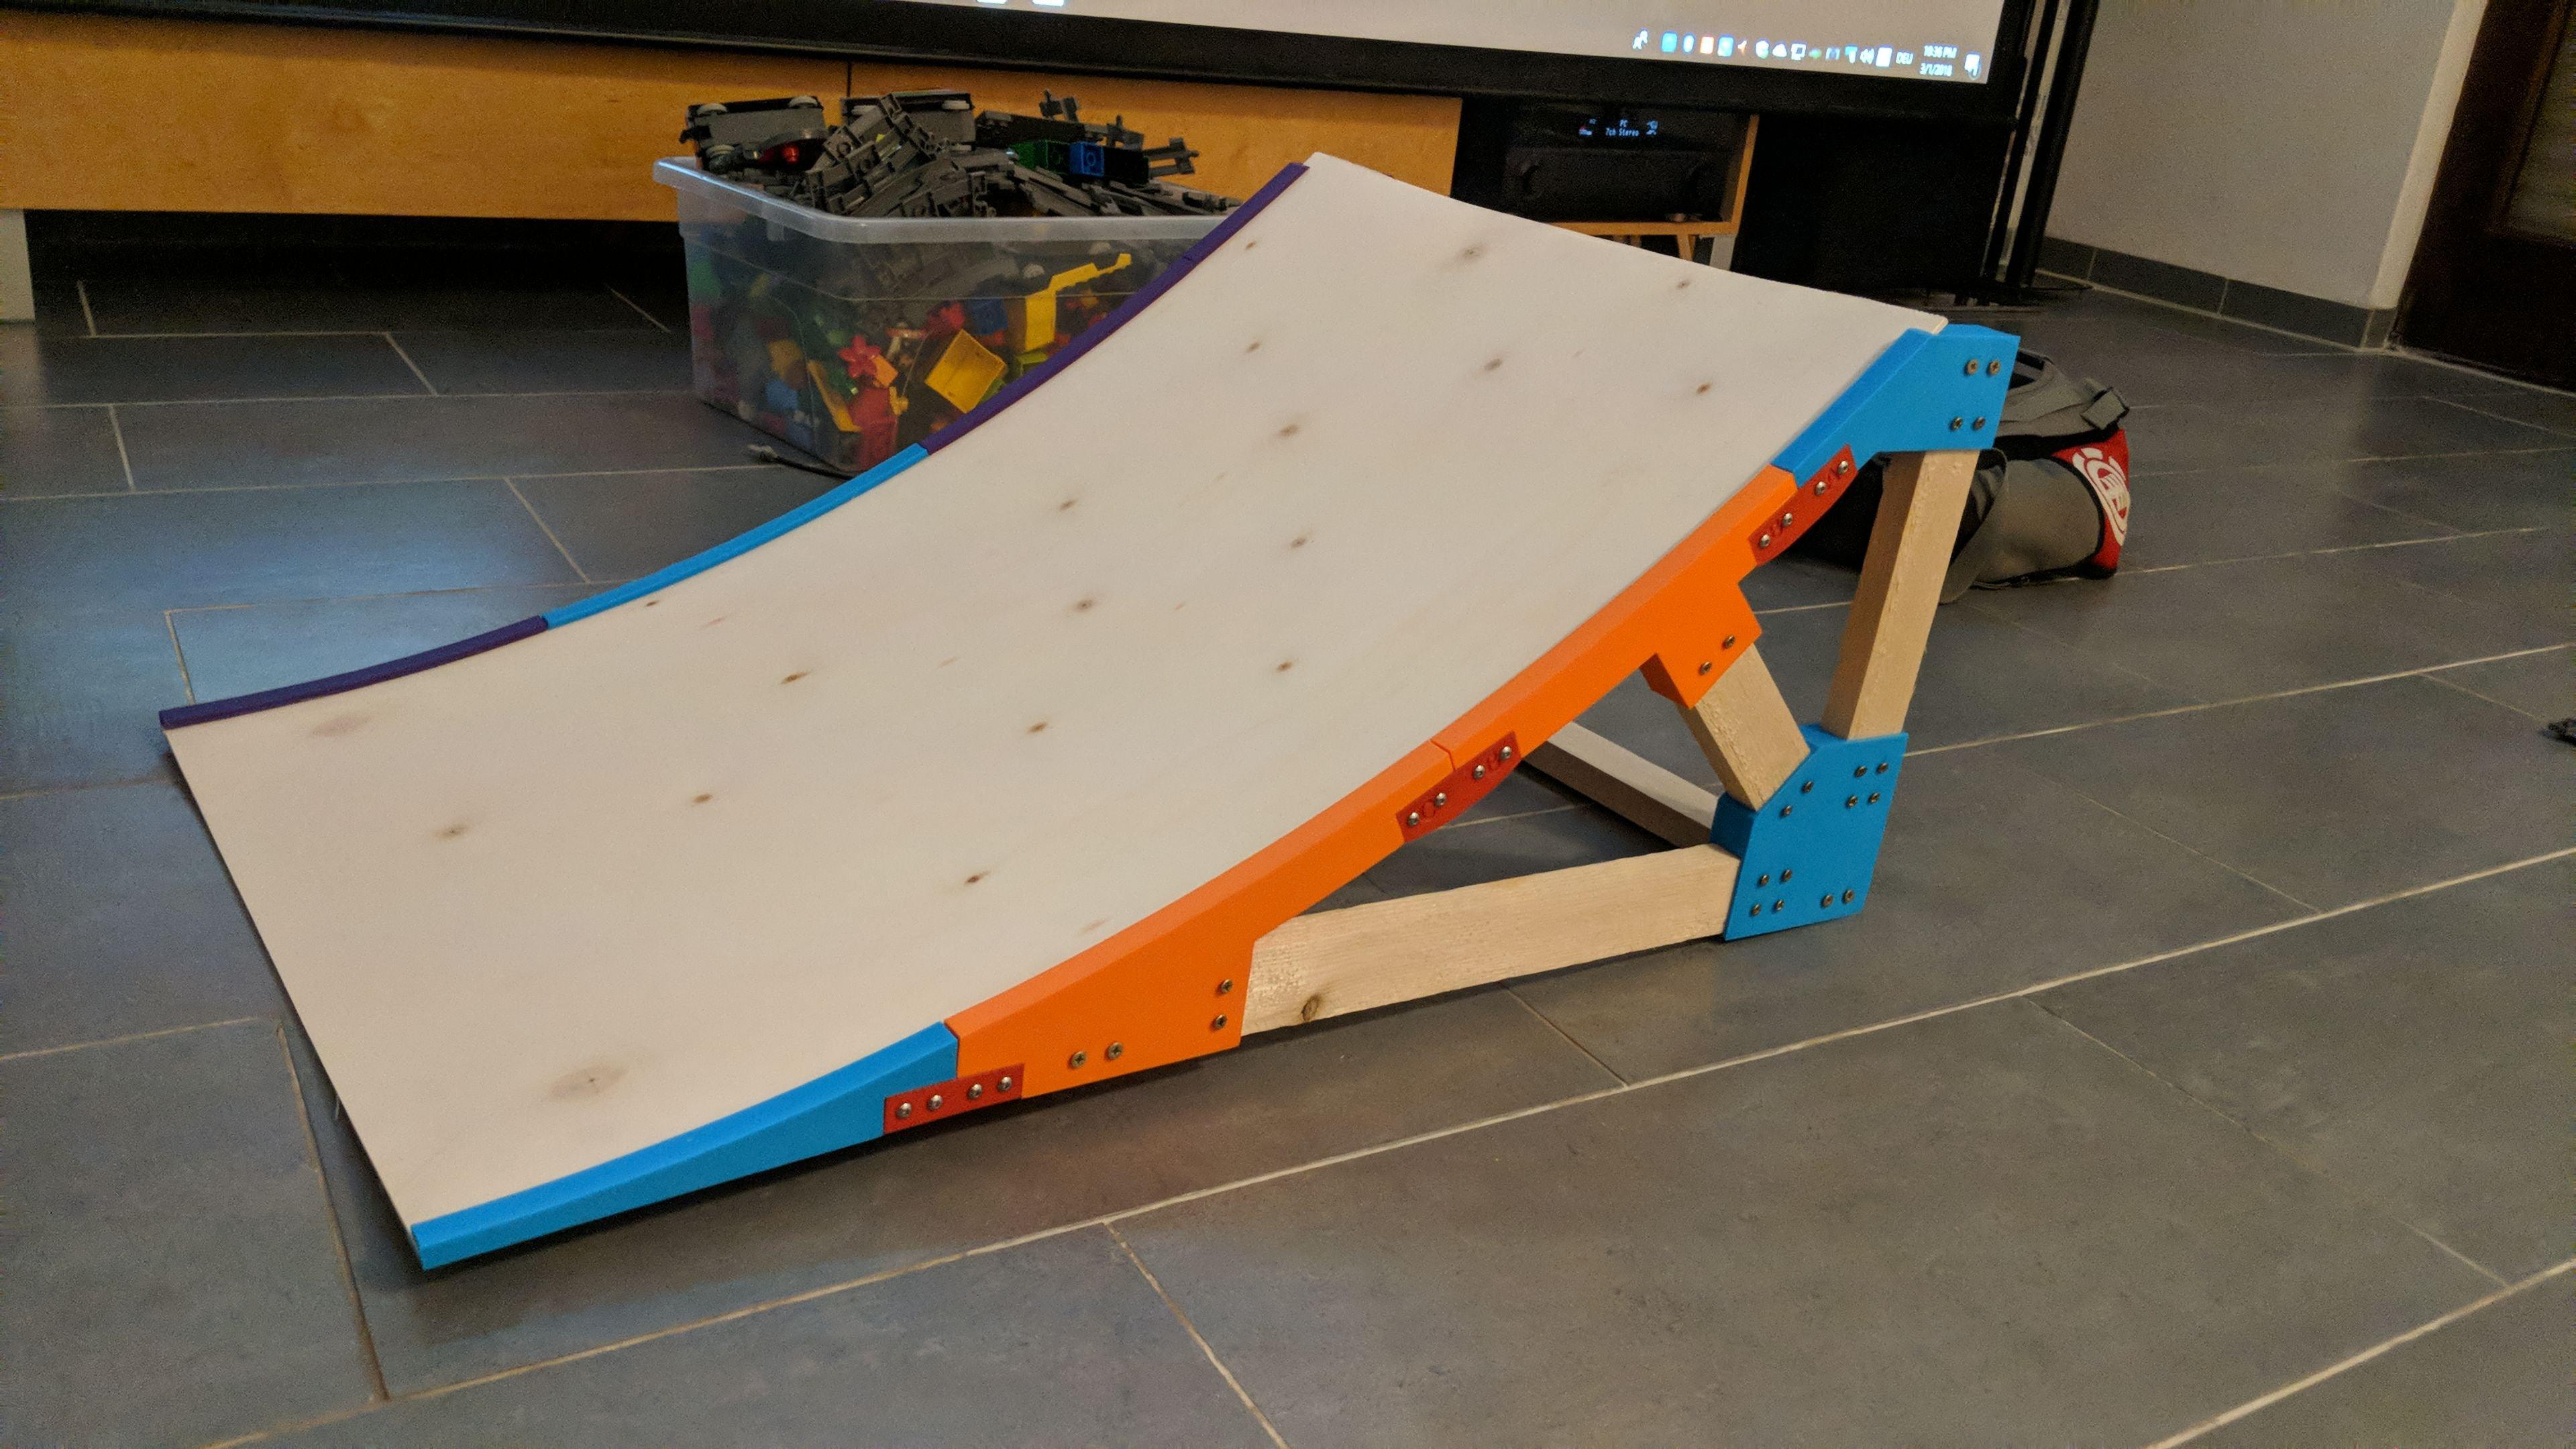 rc car ramp by mulder thingiverse. Black Bedroom Furniture Sets. Home Design Ideas